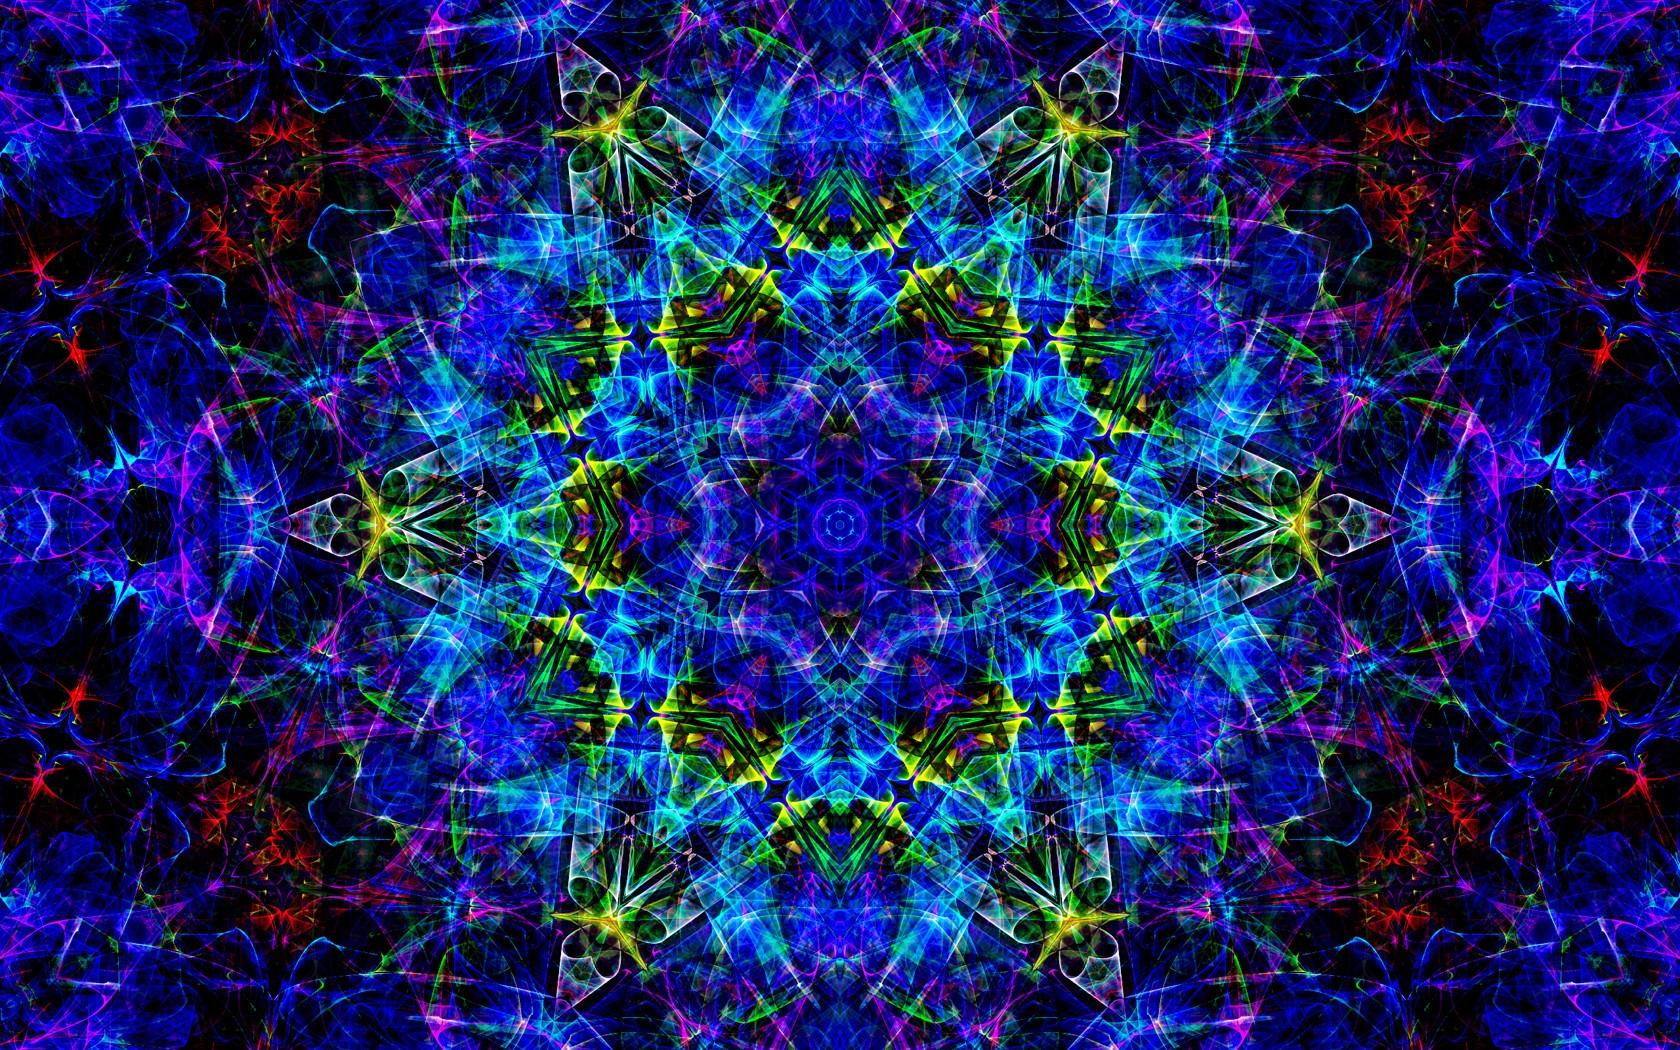 Wallpaper Abstract Symmetry Kaleidoscope Universe Fractal